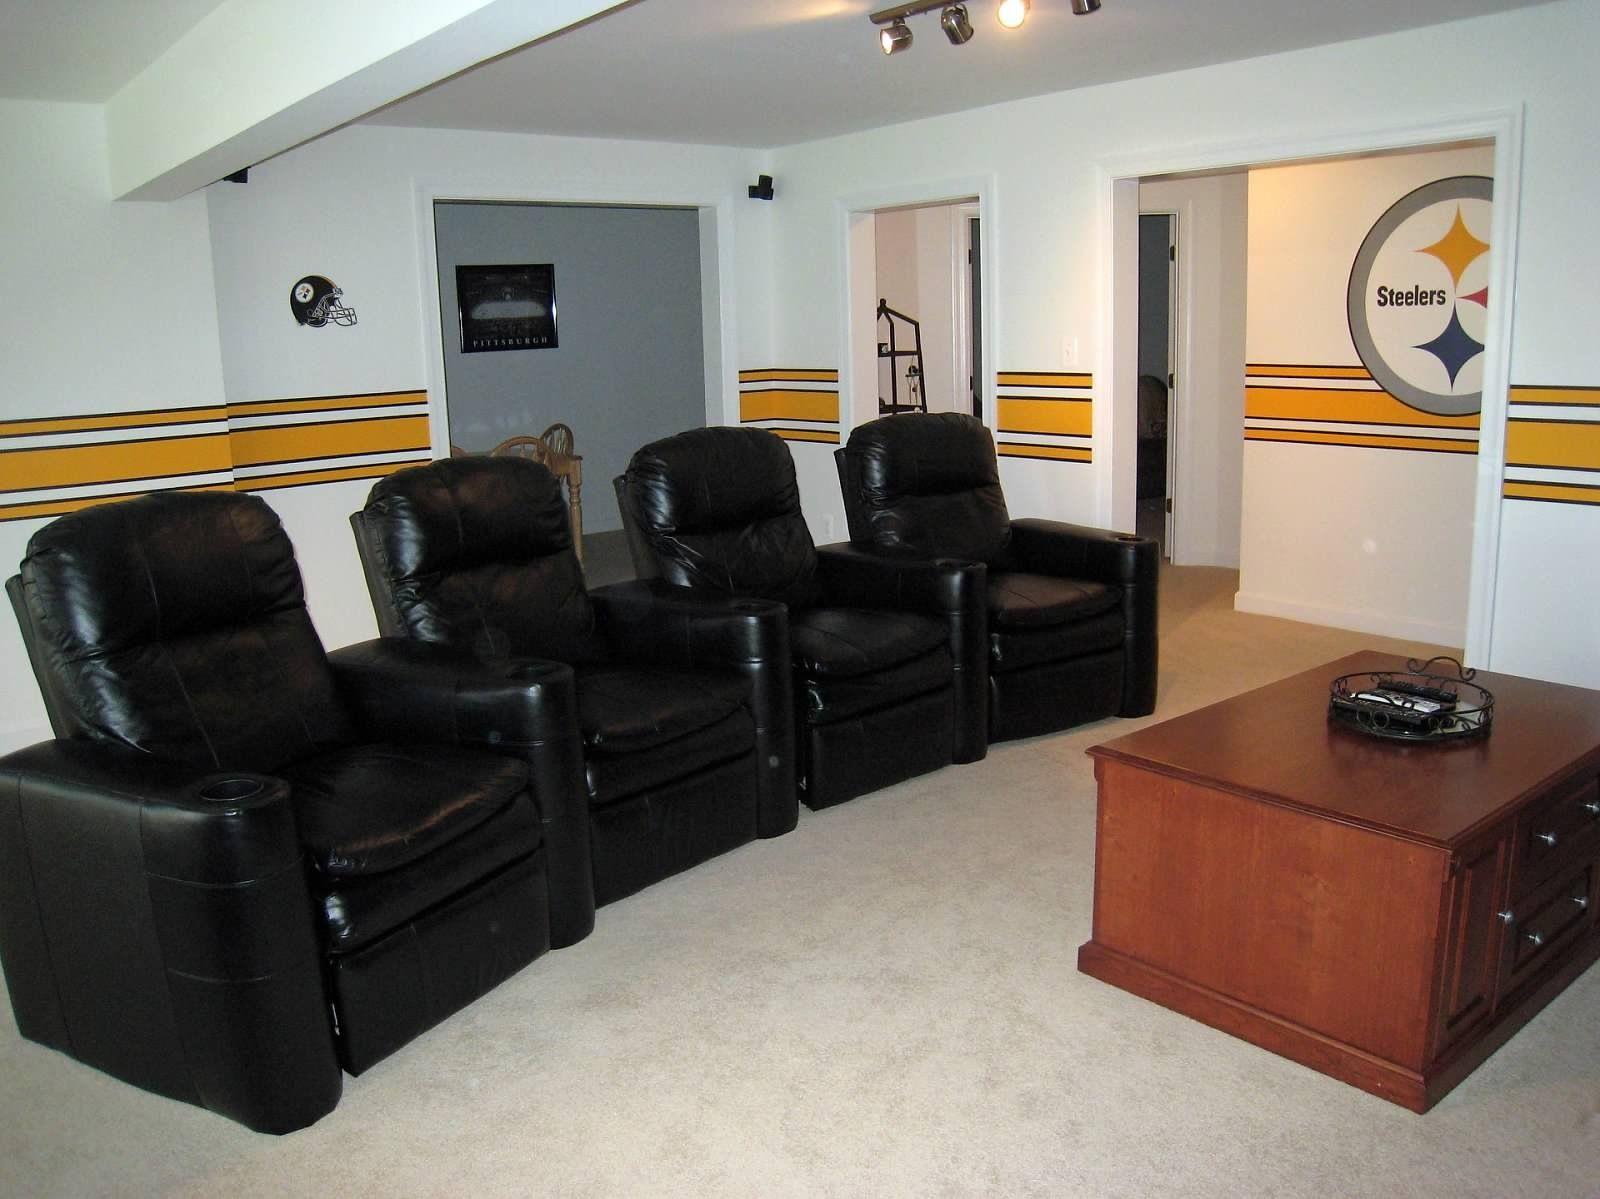 Pin By Matt August On Steelers Rooms Ideas Man Cave Bathroom Pittsburgh Steelers Man Cave Man Cave Room